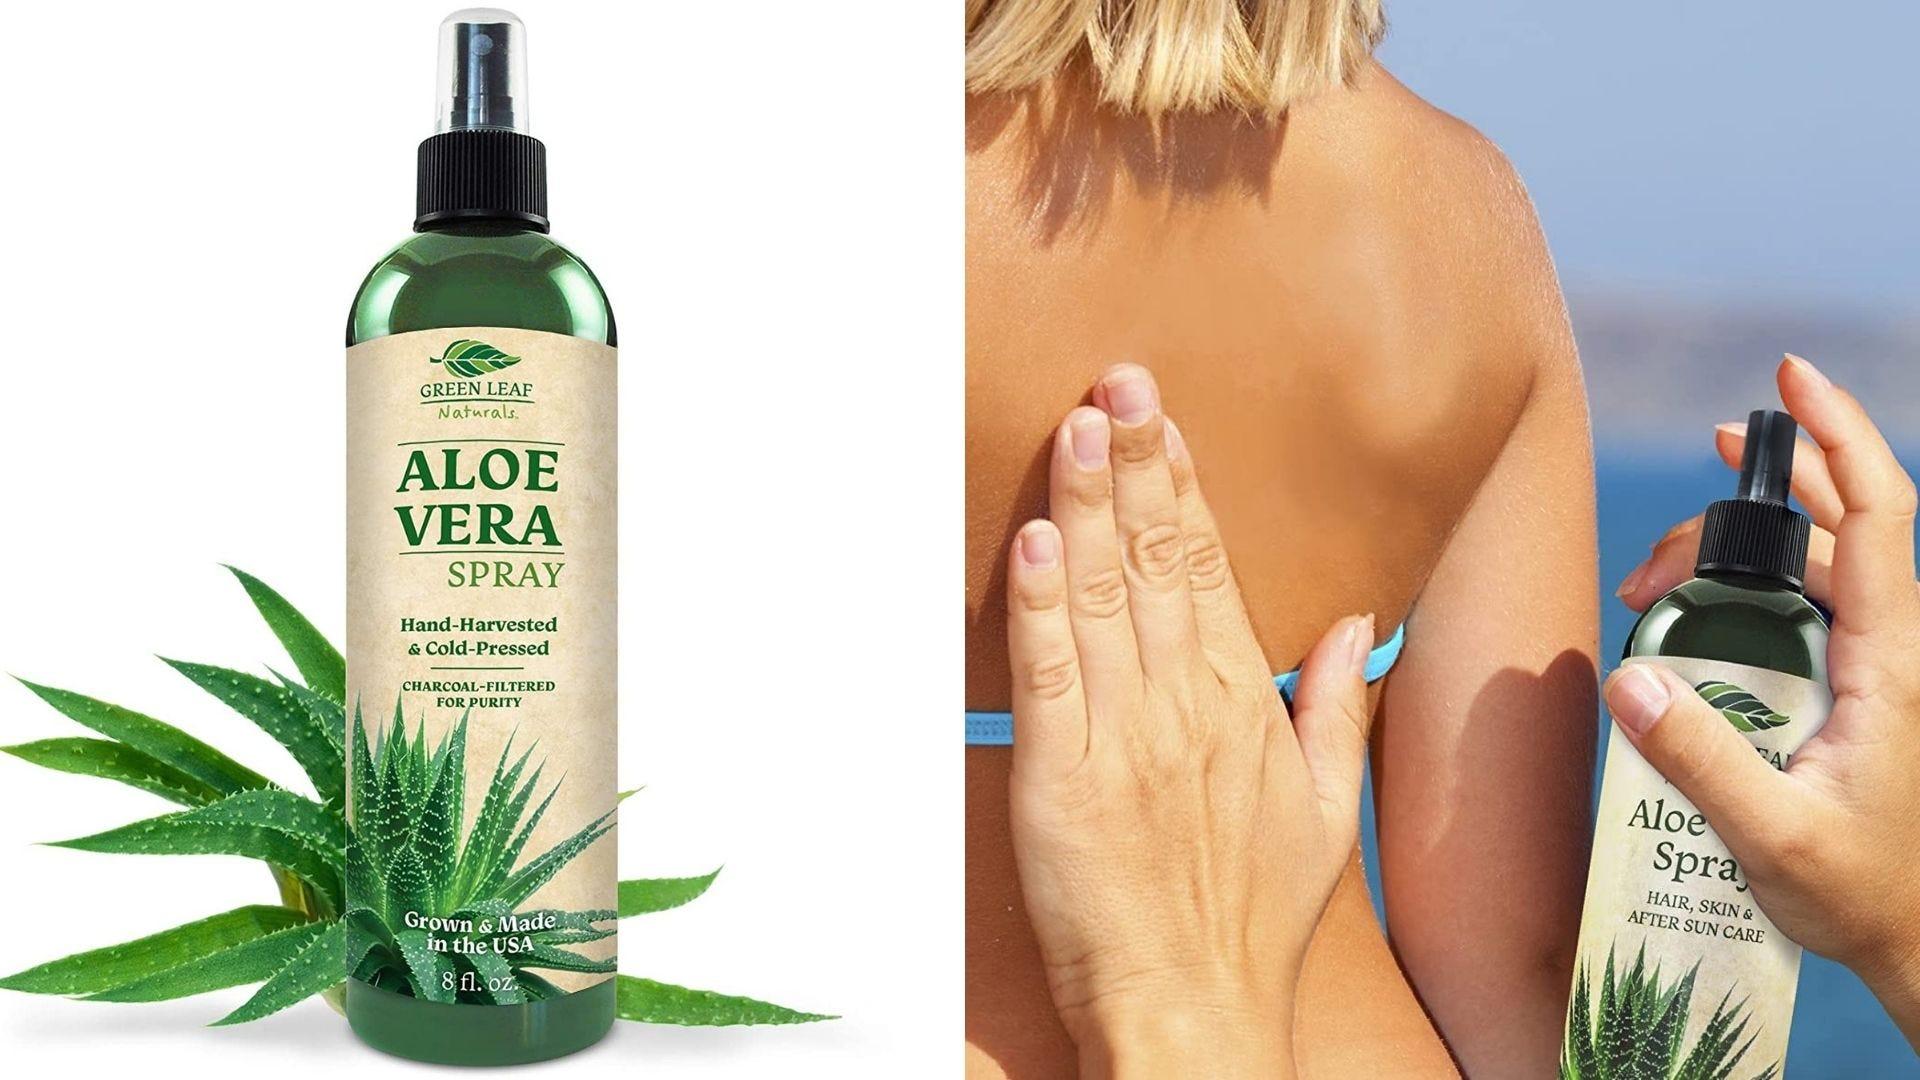 A bottle of aloe vera spray. Someone sprays a woman's back.